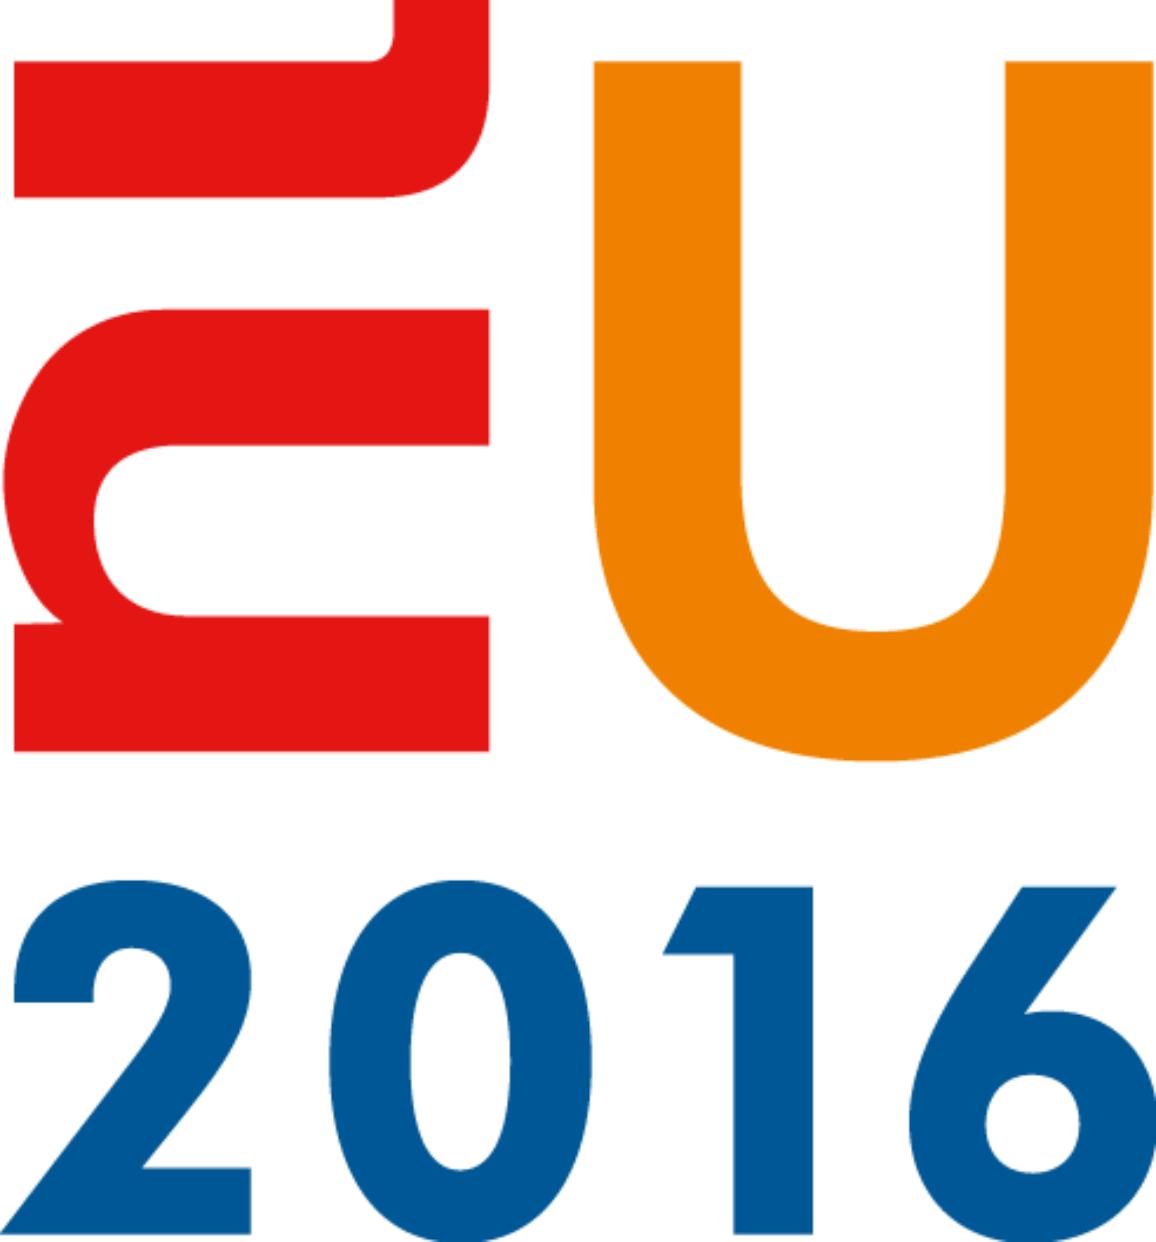 Image of the logo of The Netherlands EU Presidency 2016